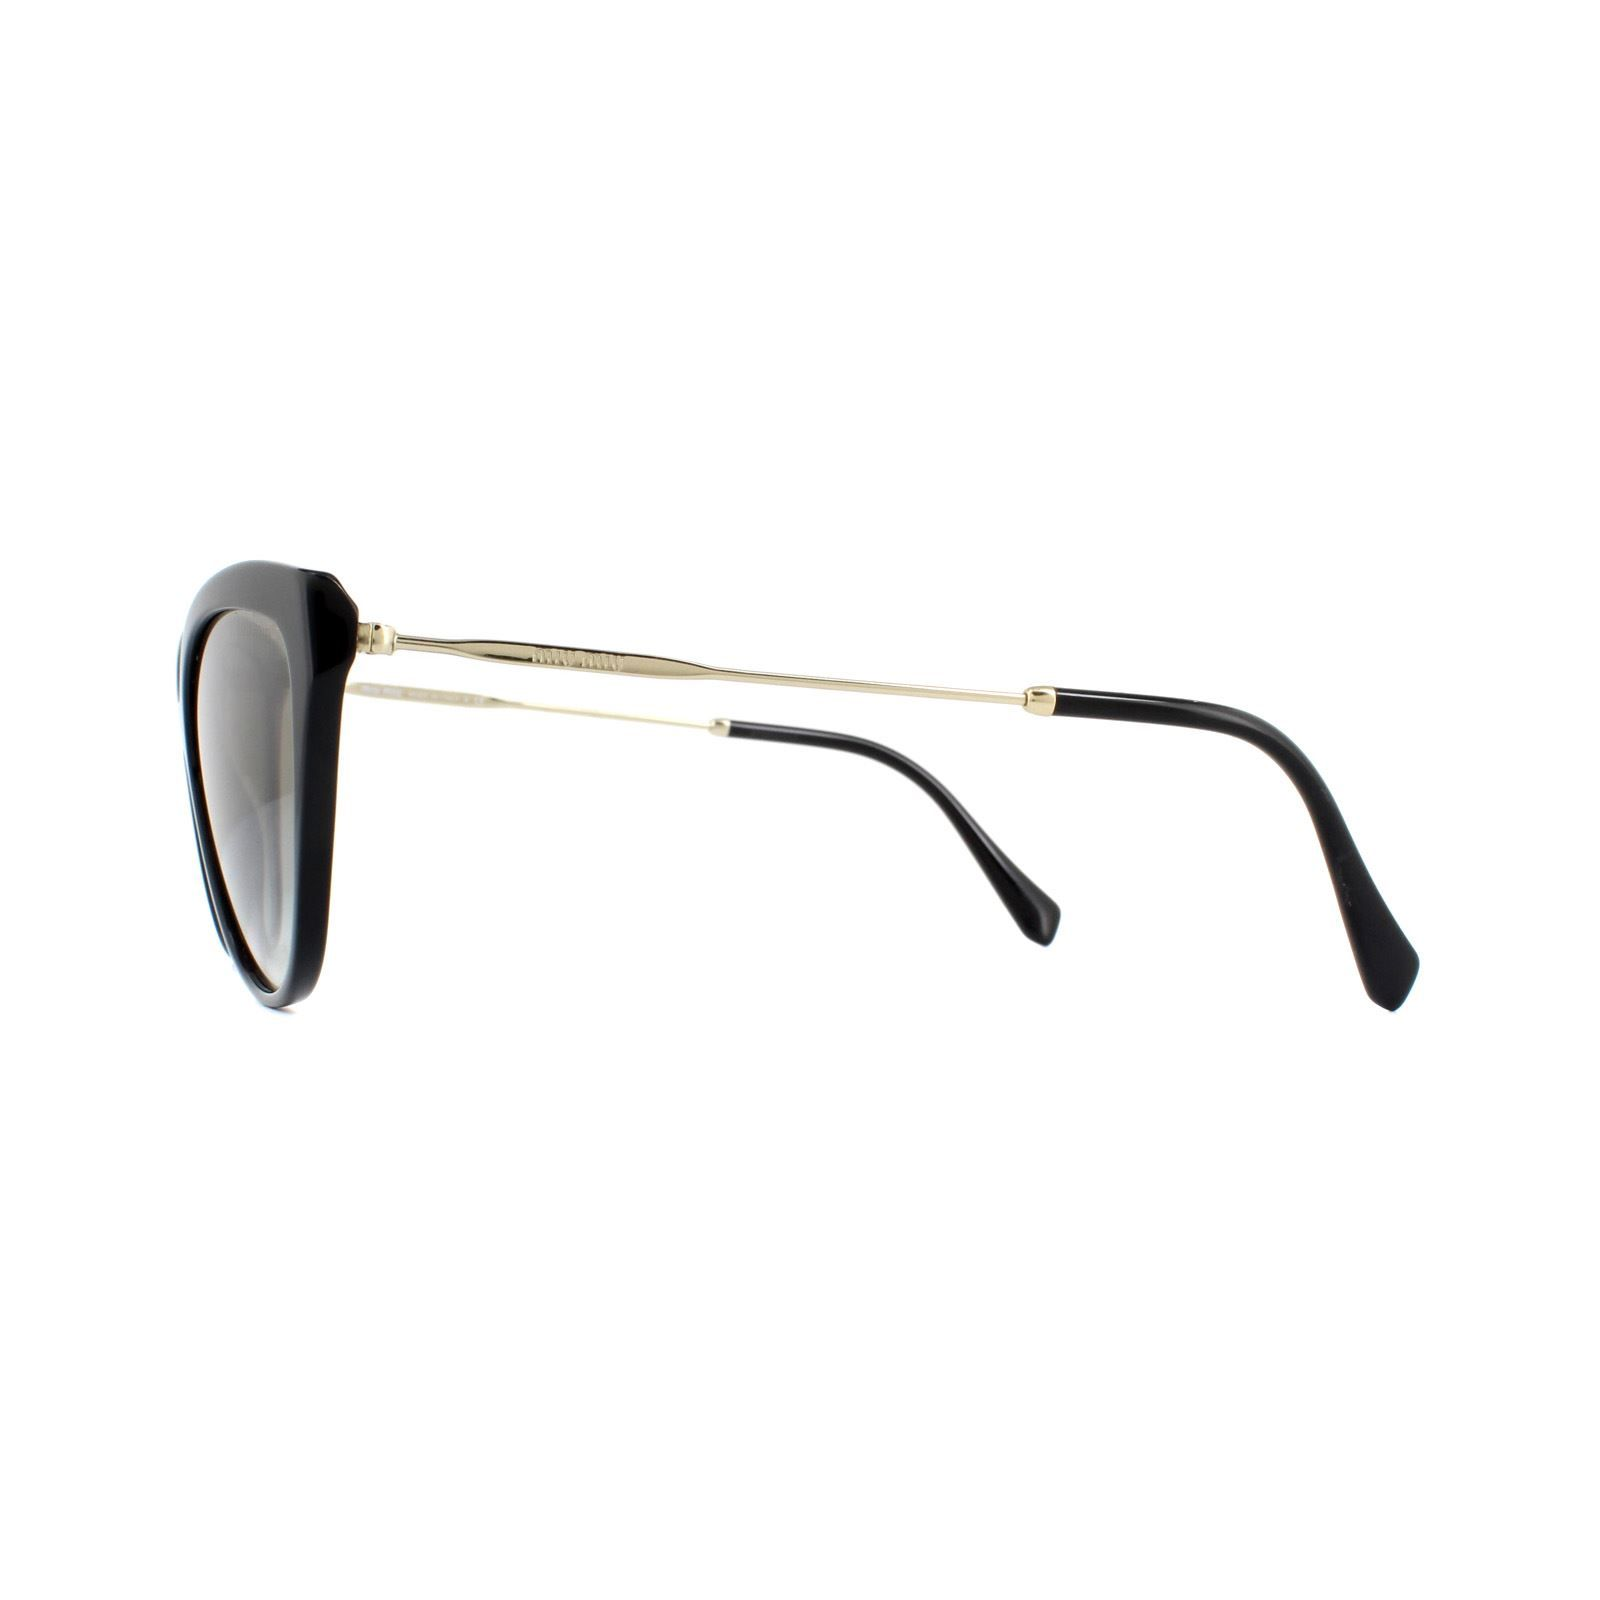 Miu Miu Sunglasses MU03US 1AB5O0 Black Gradient Grey Mirror Silver